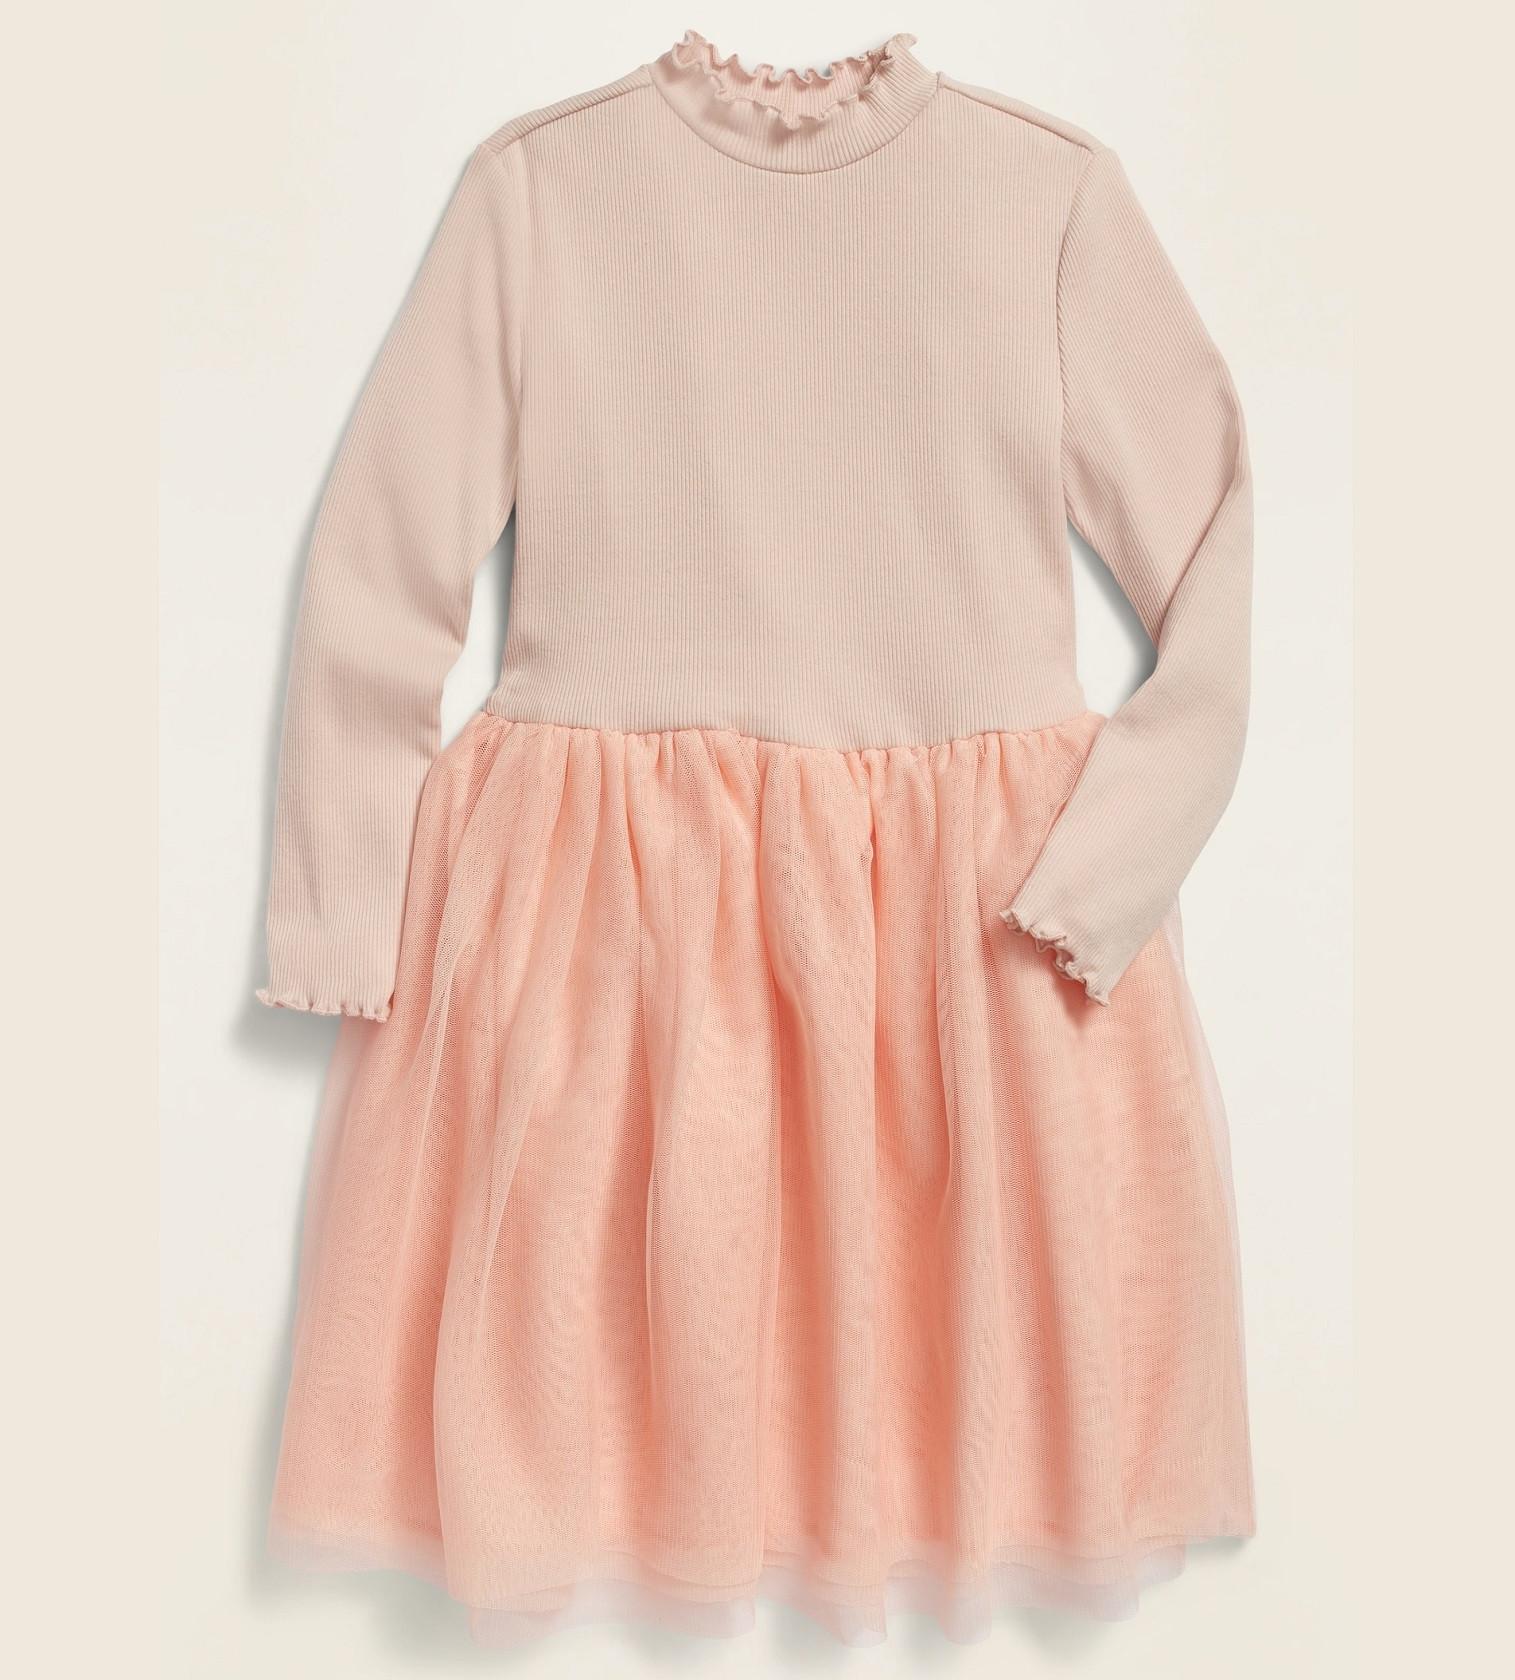 Купити Сукня Old Navy Rib-Knit Tutu: Shell Pink - фото 1